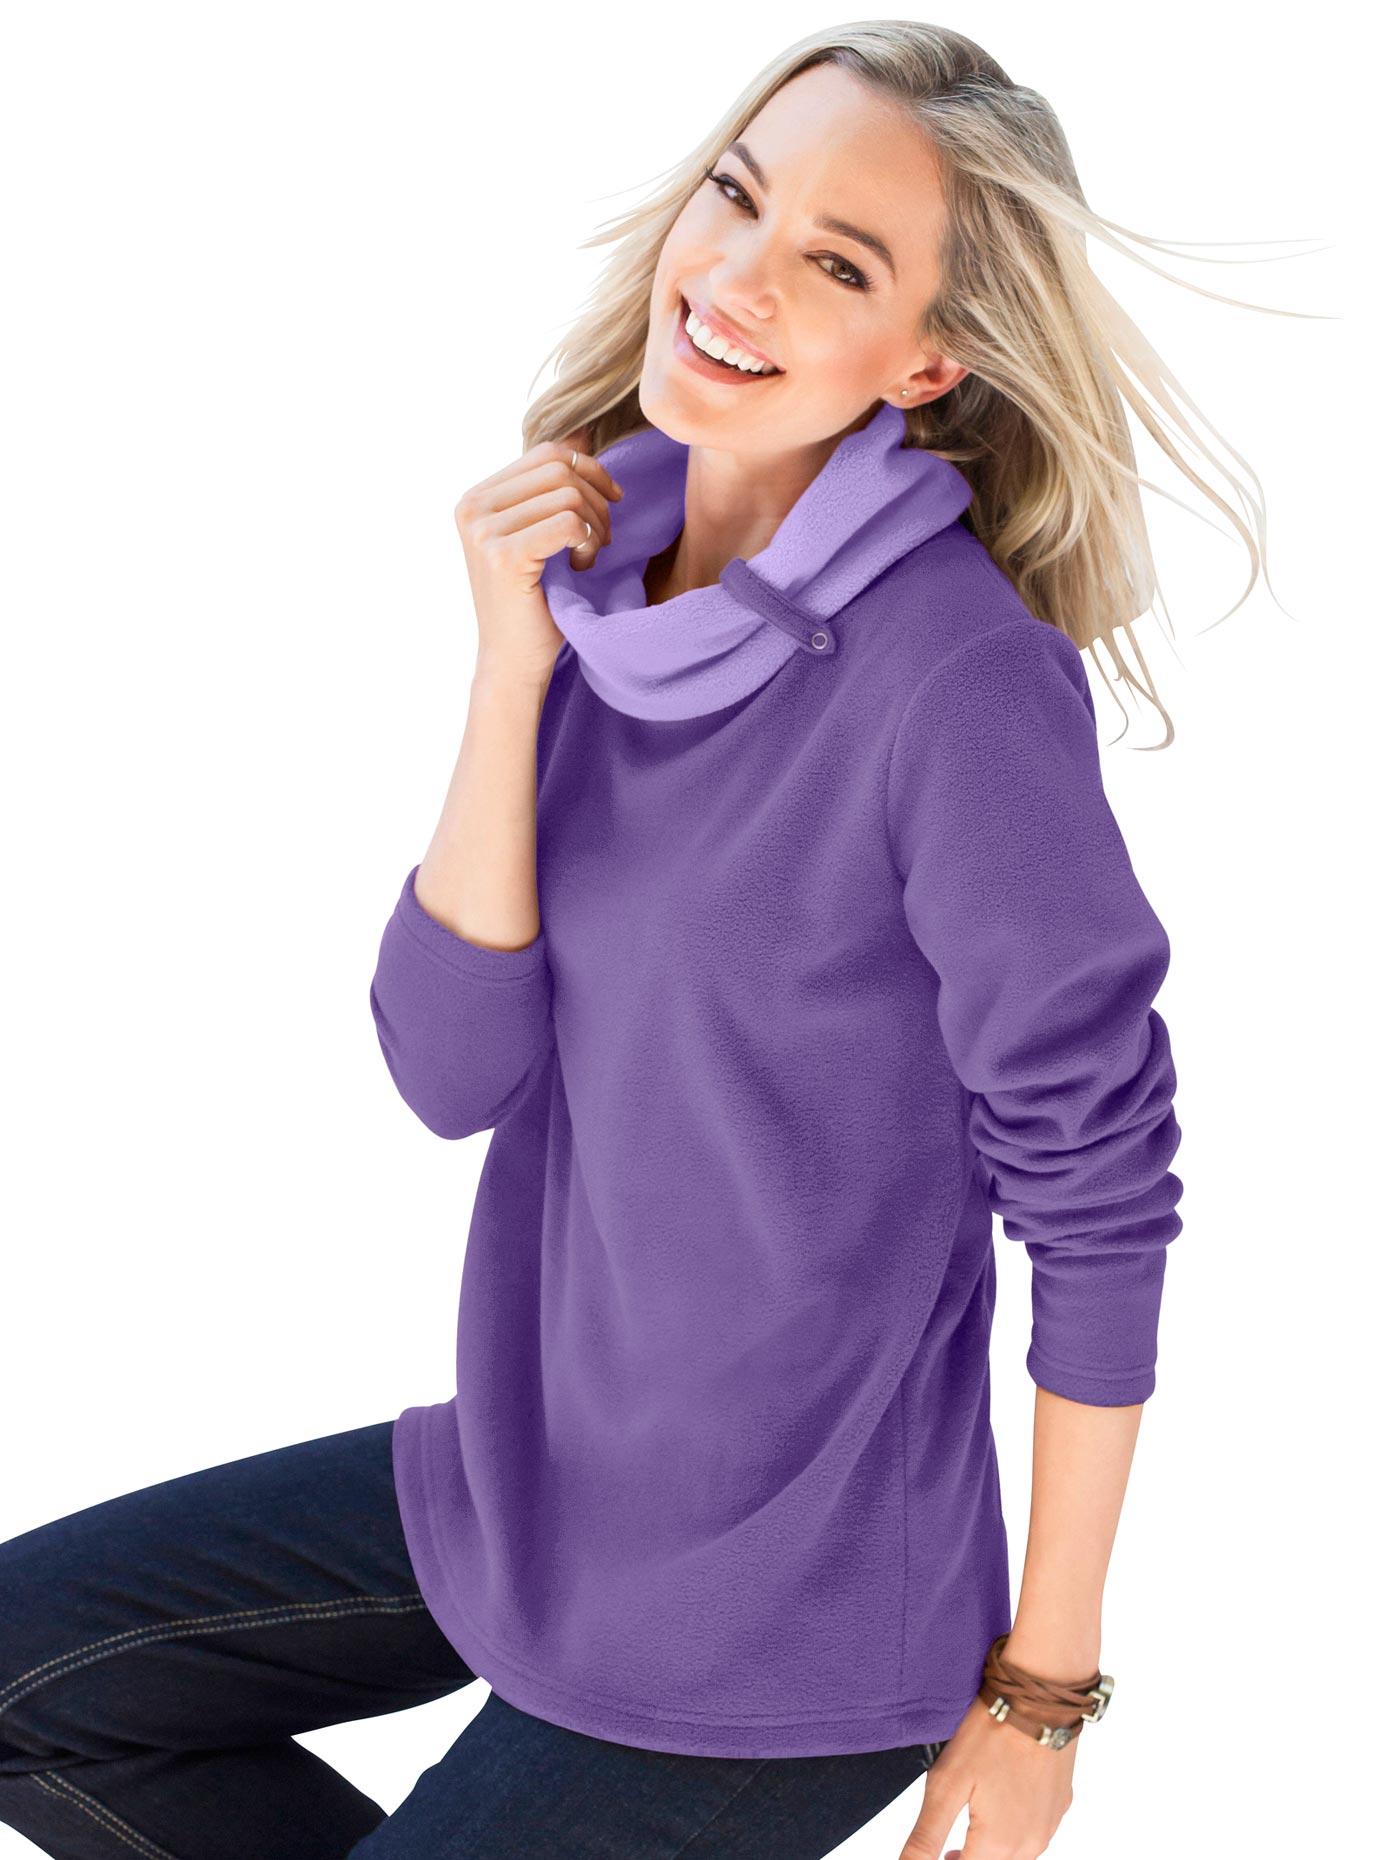 Classic Basics Fleece-Shirt mit doppellagigem Rollkragen   Bekleidung > Sweatshirts & -jacken > Fleeceshirts   Classic Basics